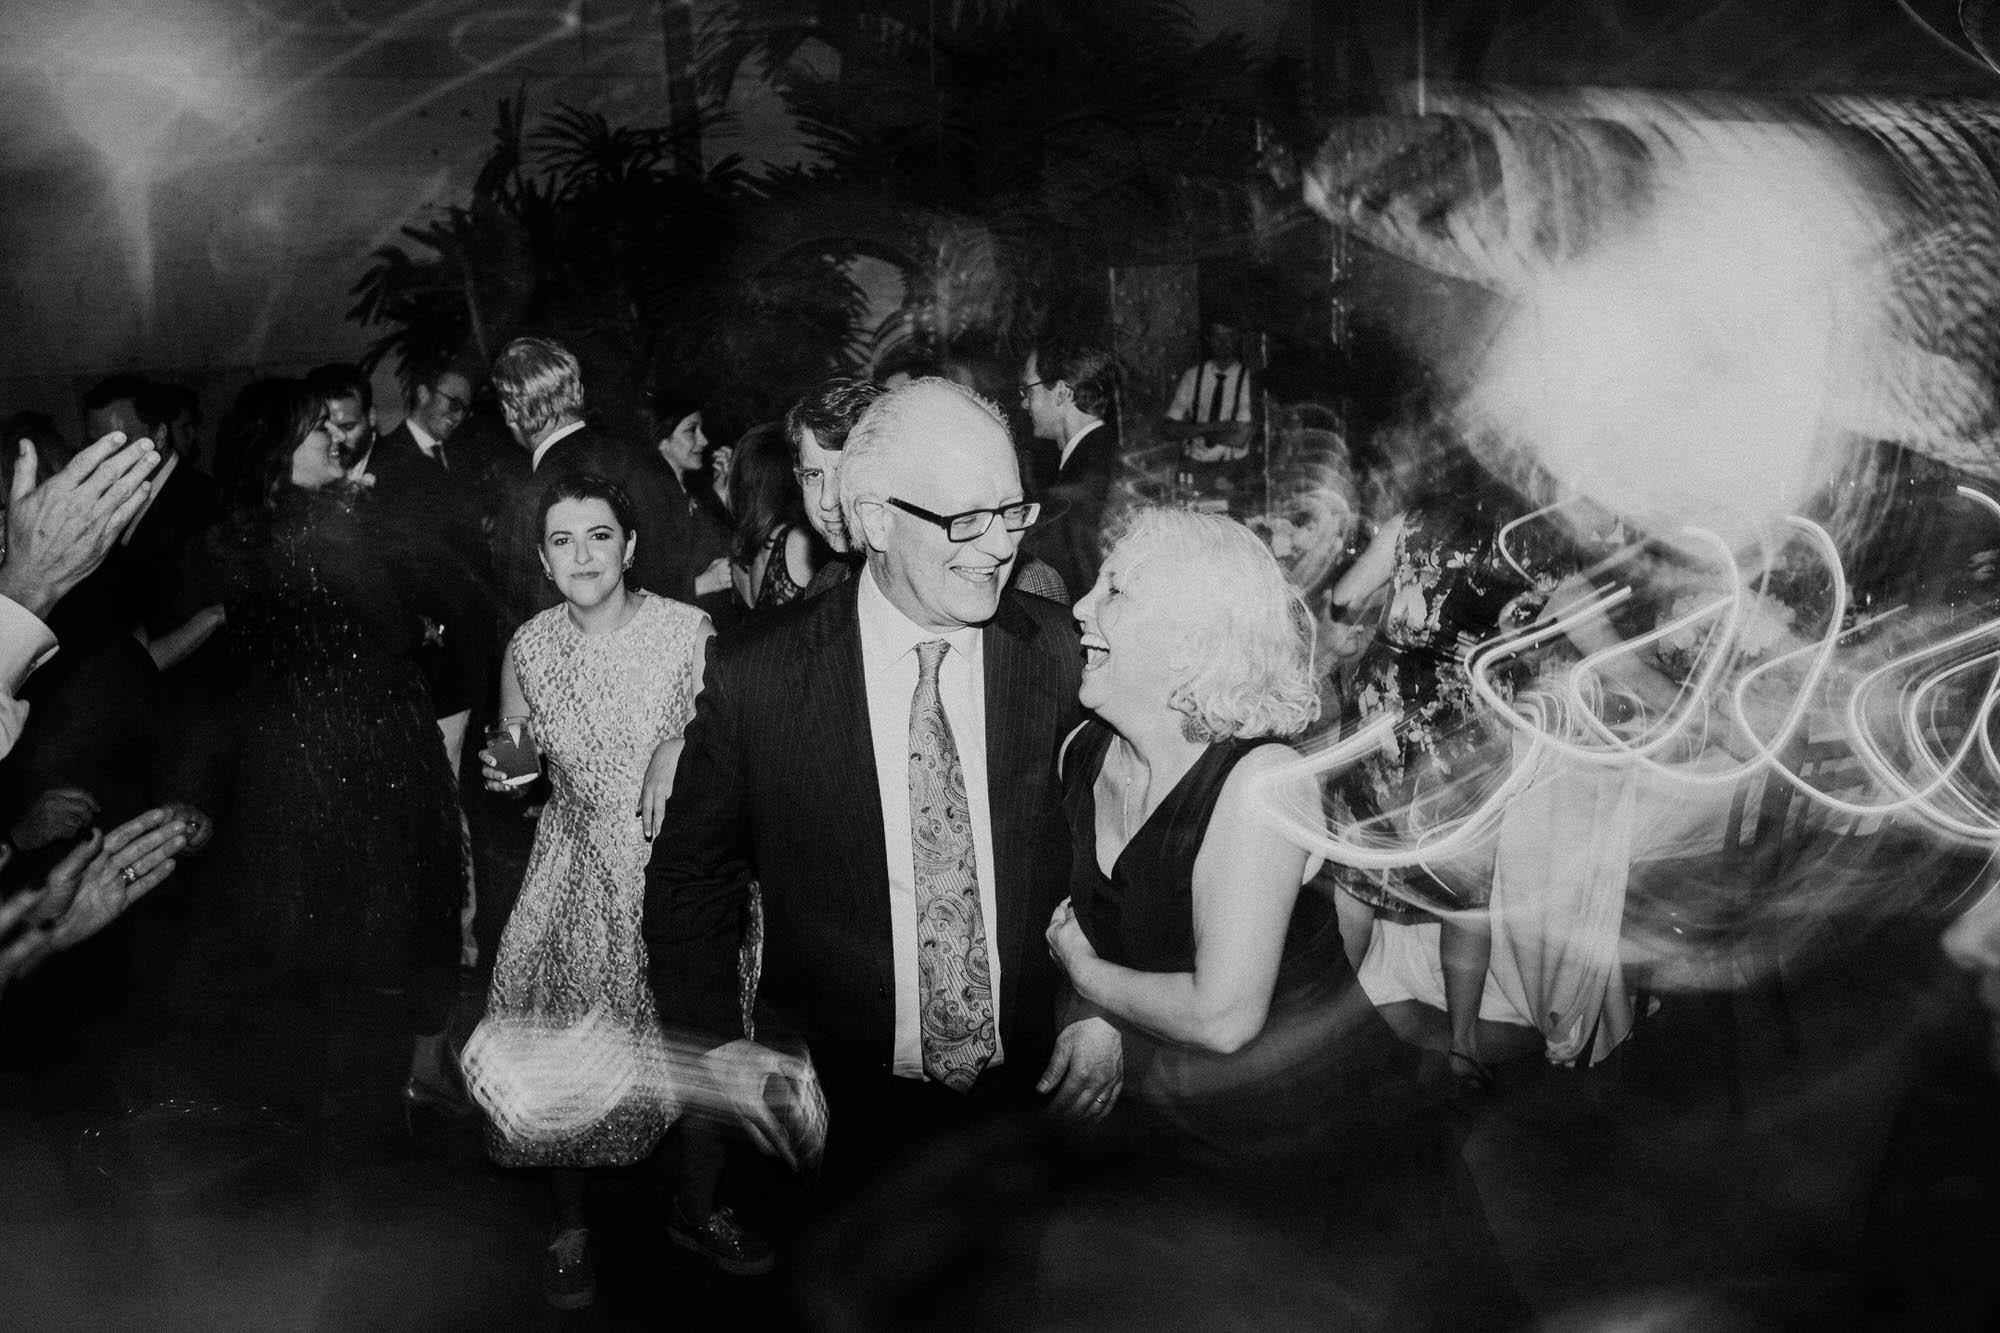 los-angeles-wedding-photographer-millwick-125.jpg